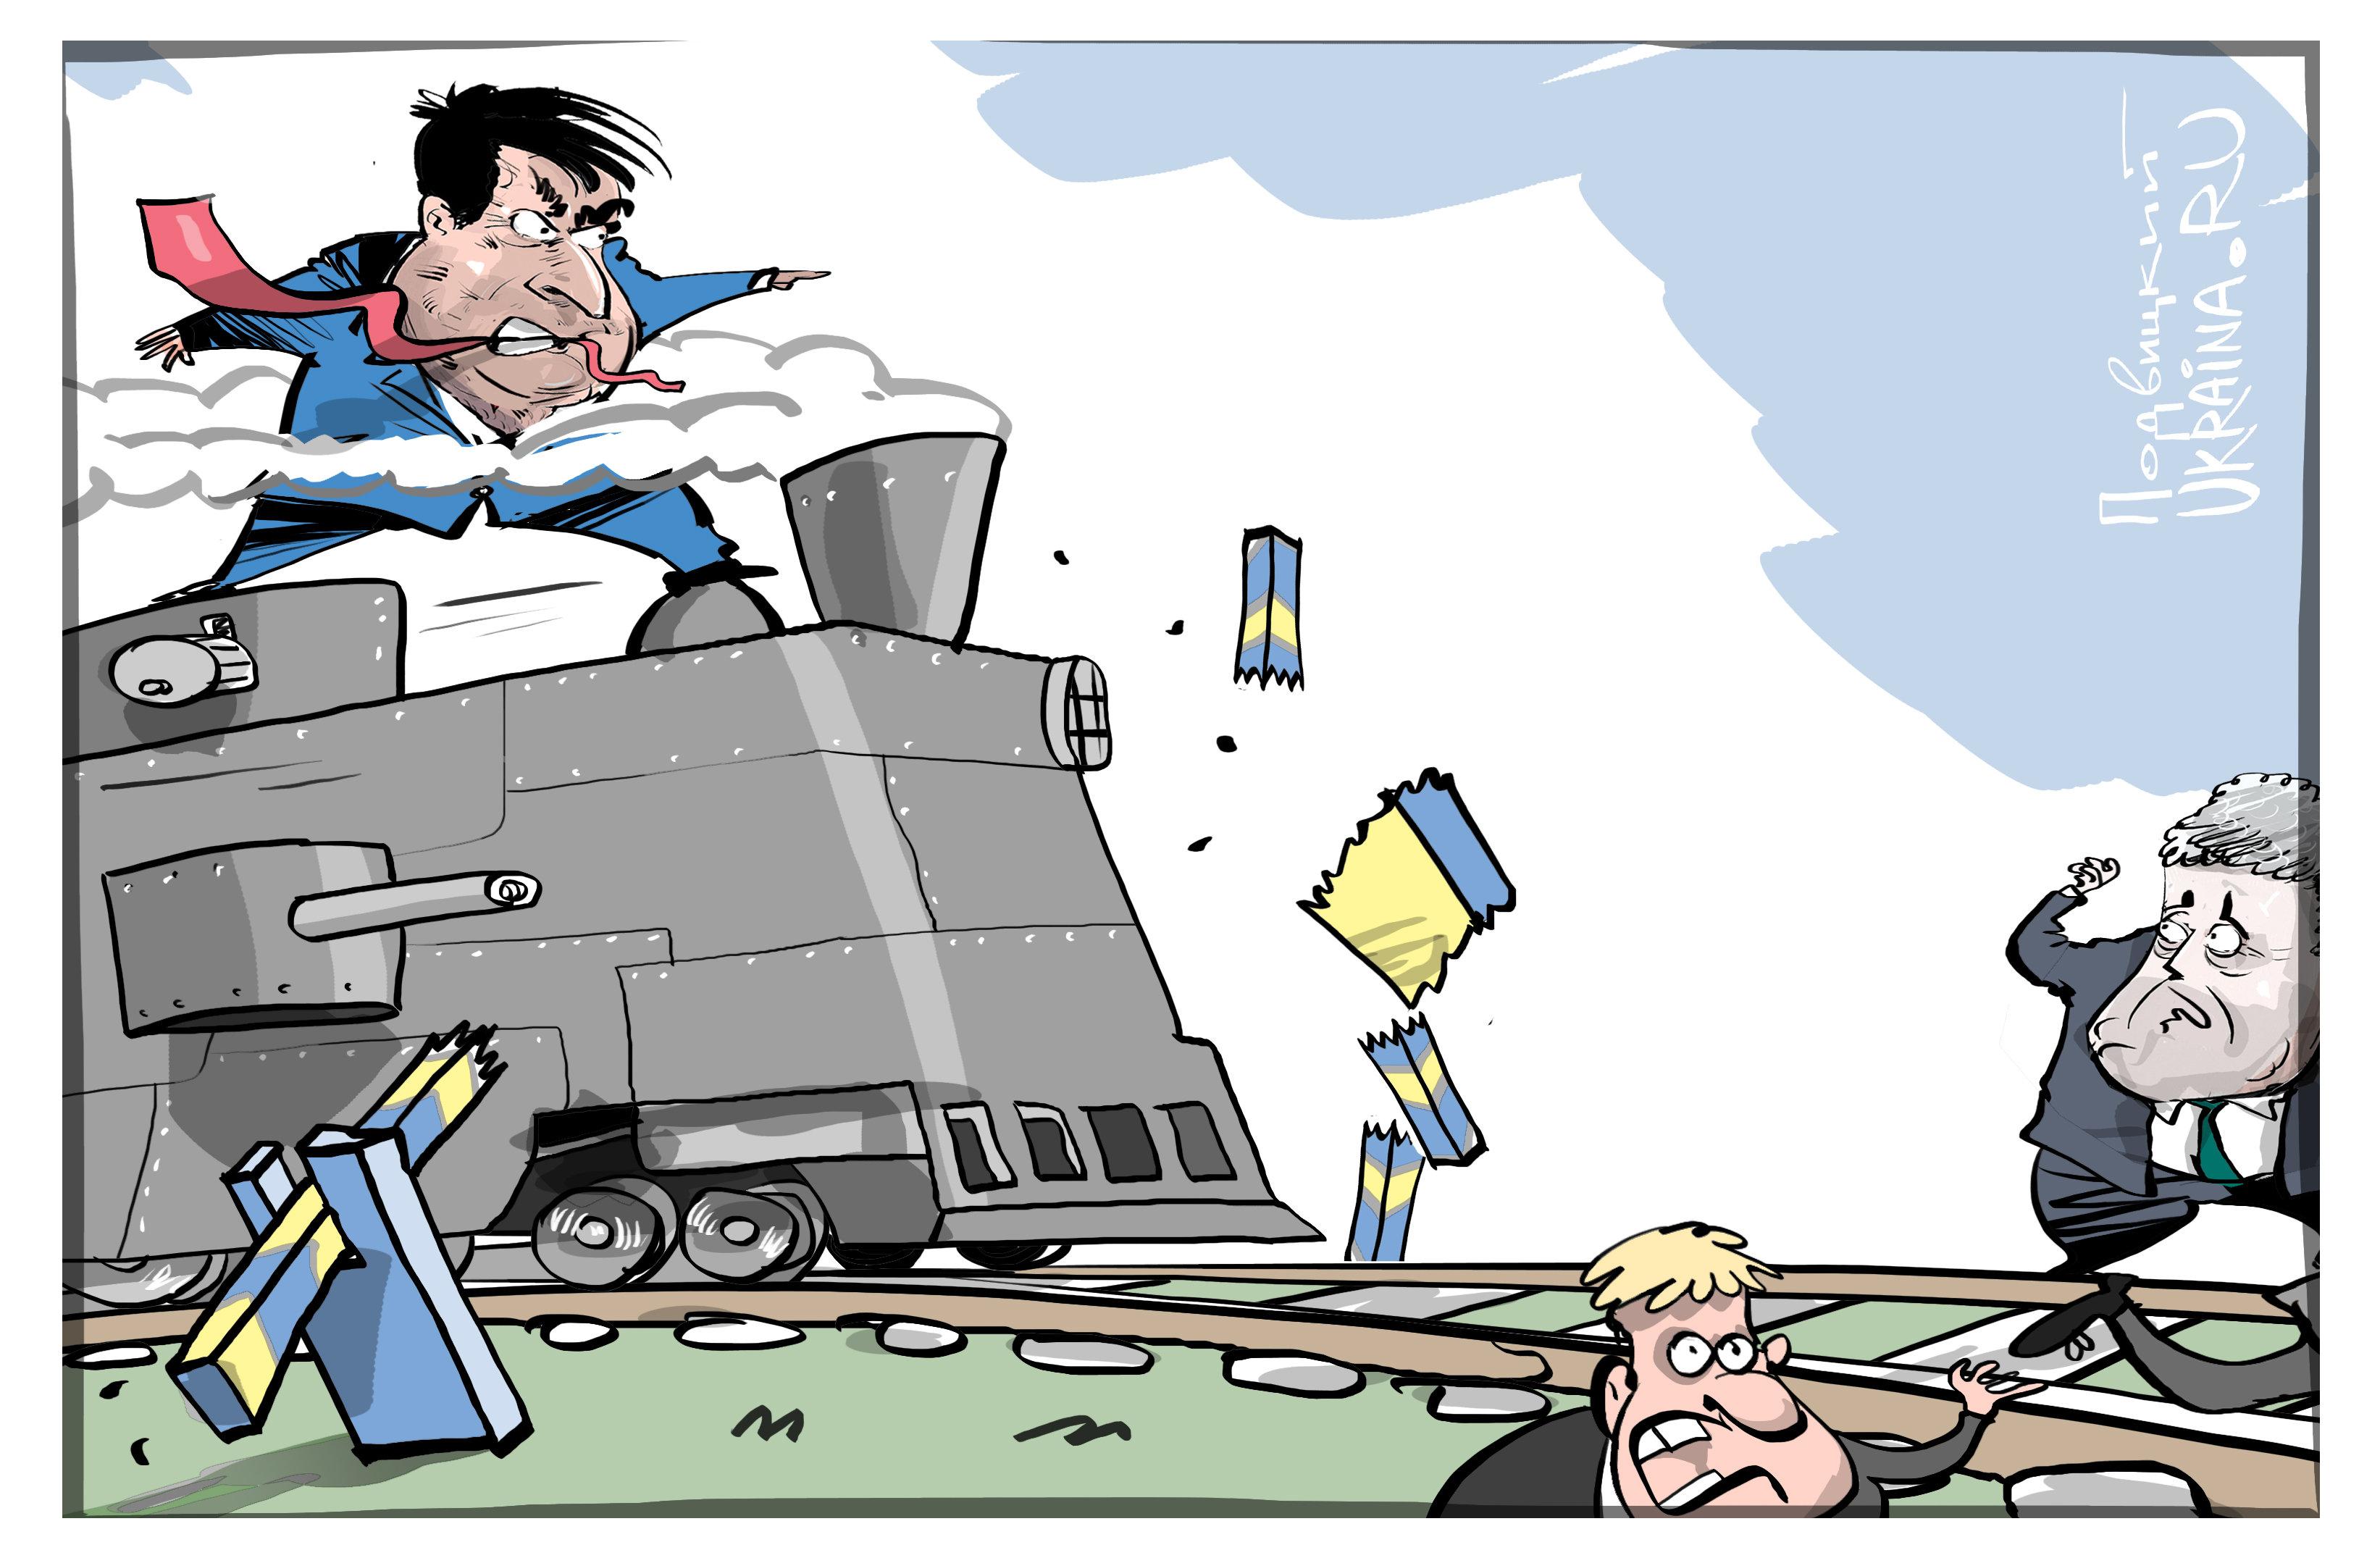 Карикатура Прорыв Саакашвили через украинскую границу